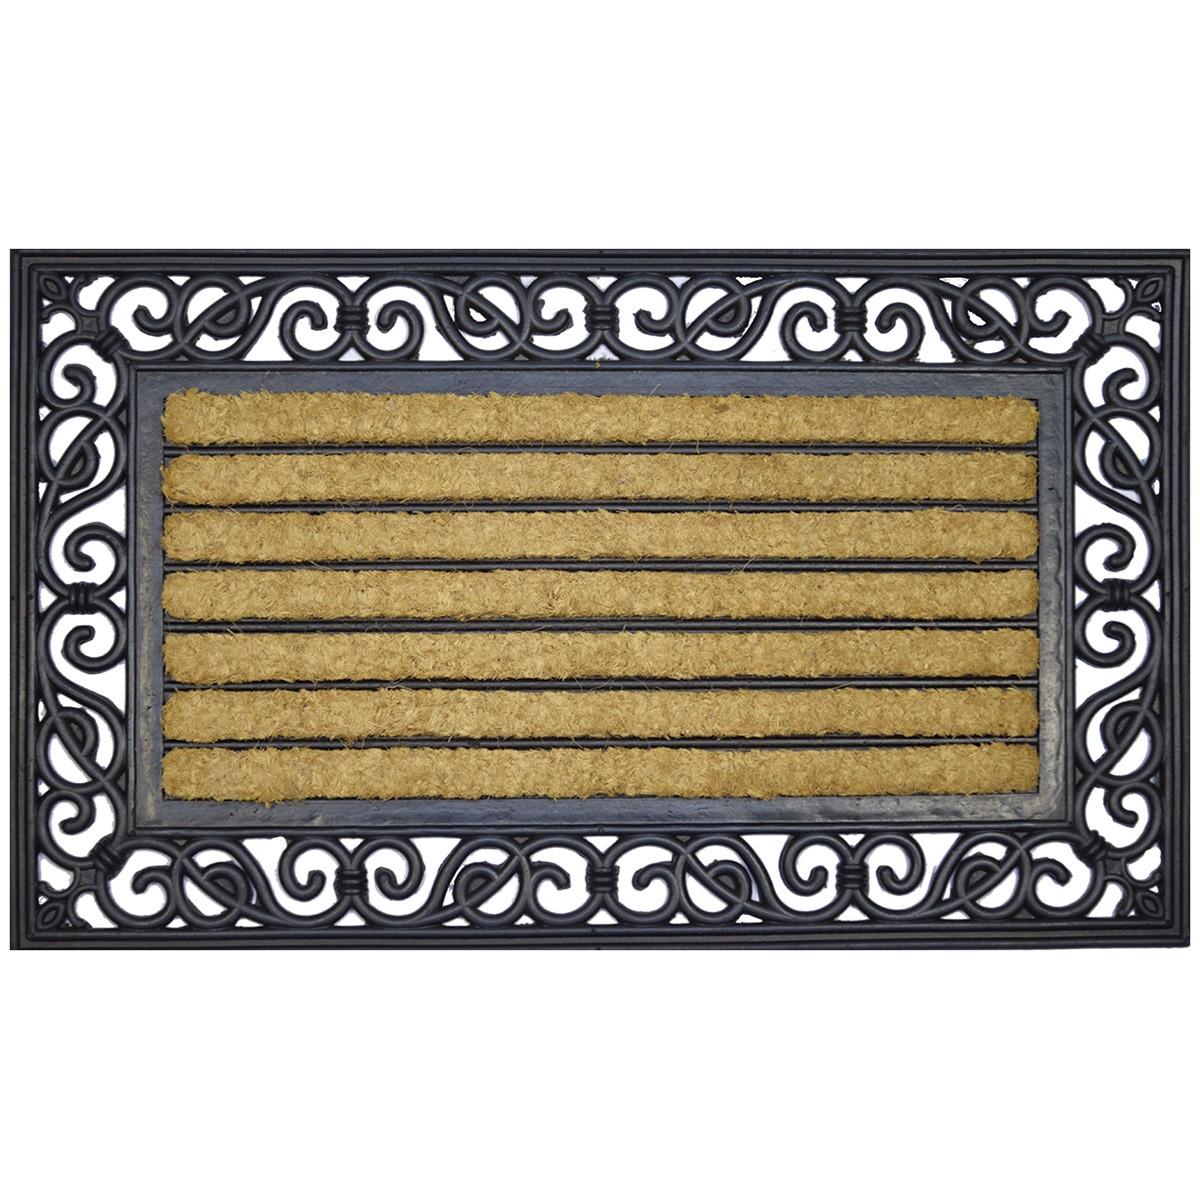 Colin Coir & Rubber Doormat, 75x45cm